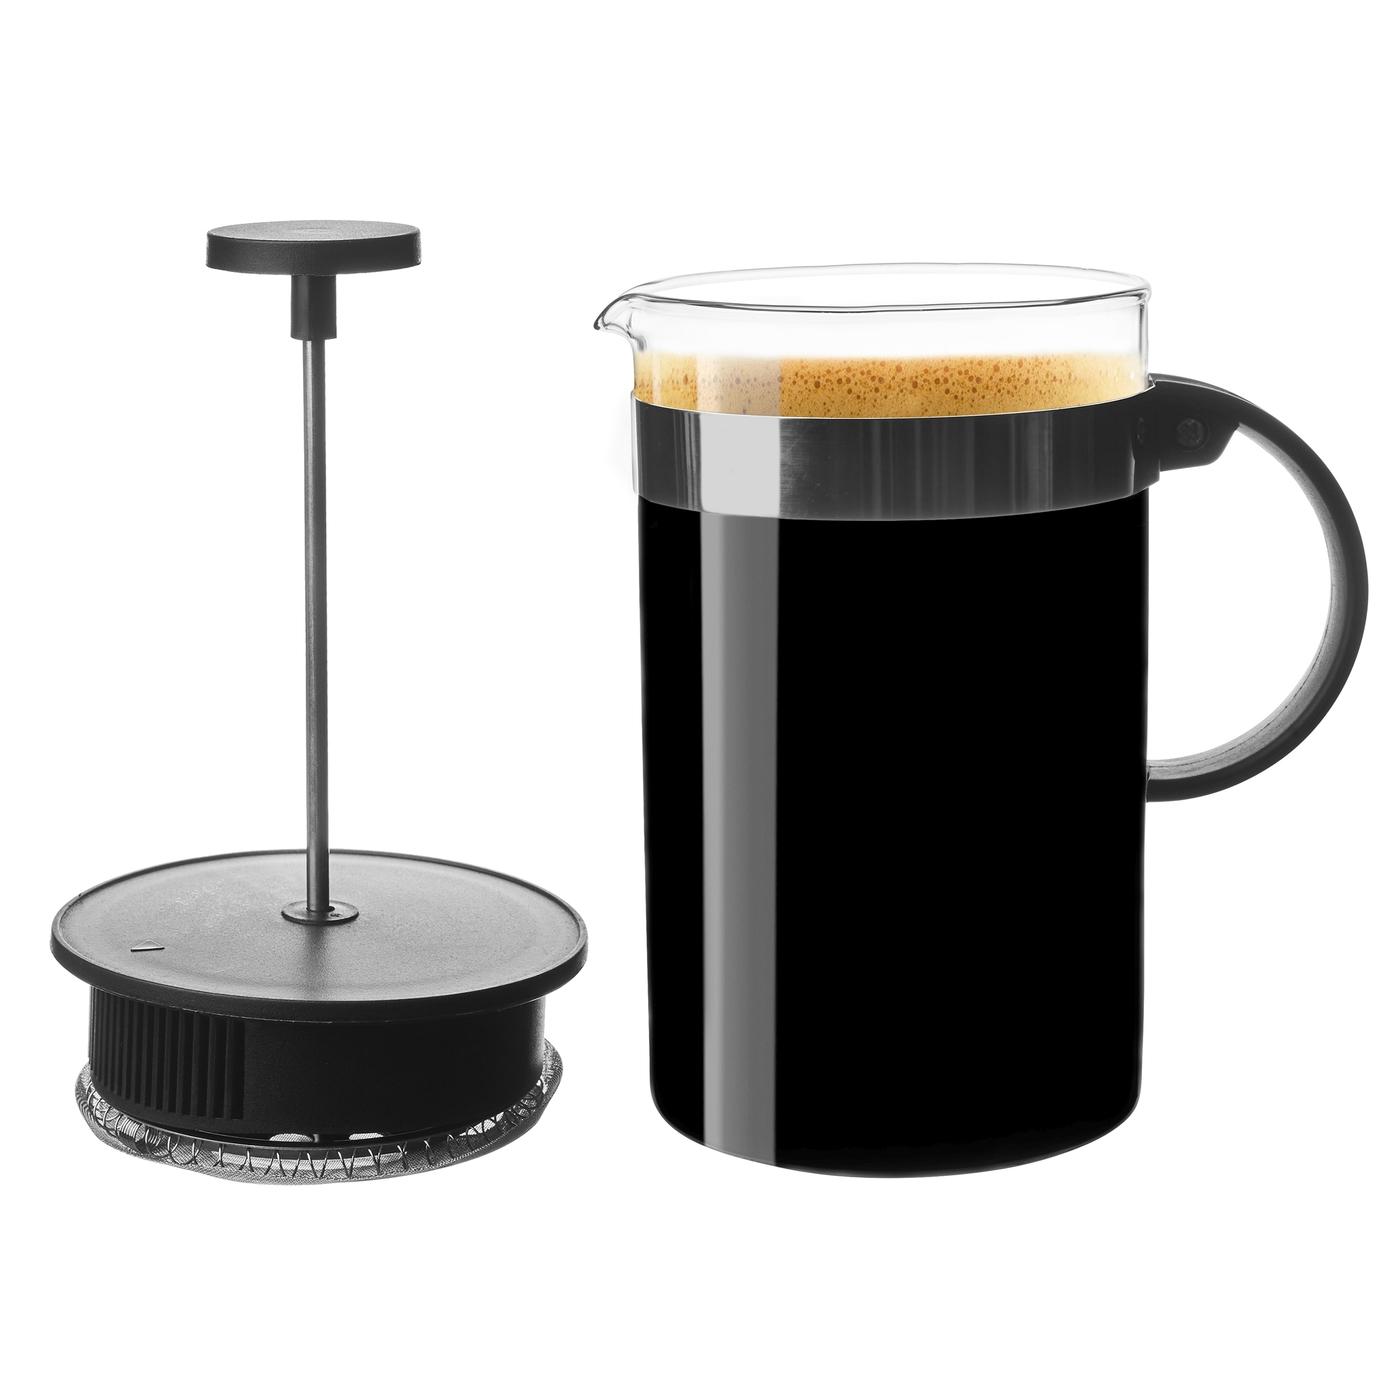 konvice 0,80l KAMELIA, COFFEE MAKER, sklo+plast